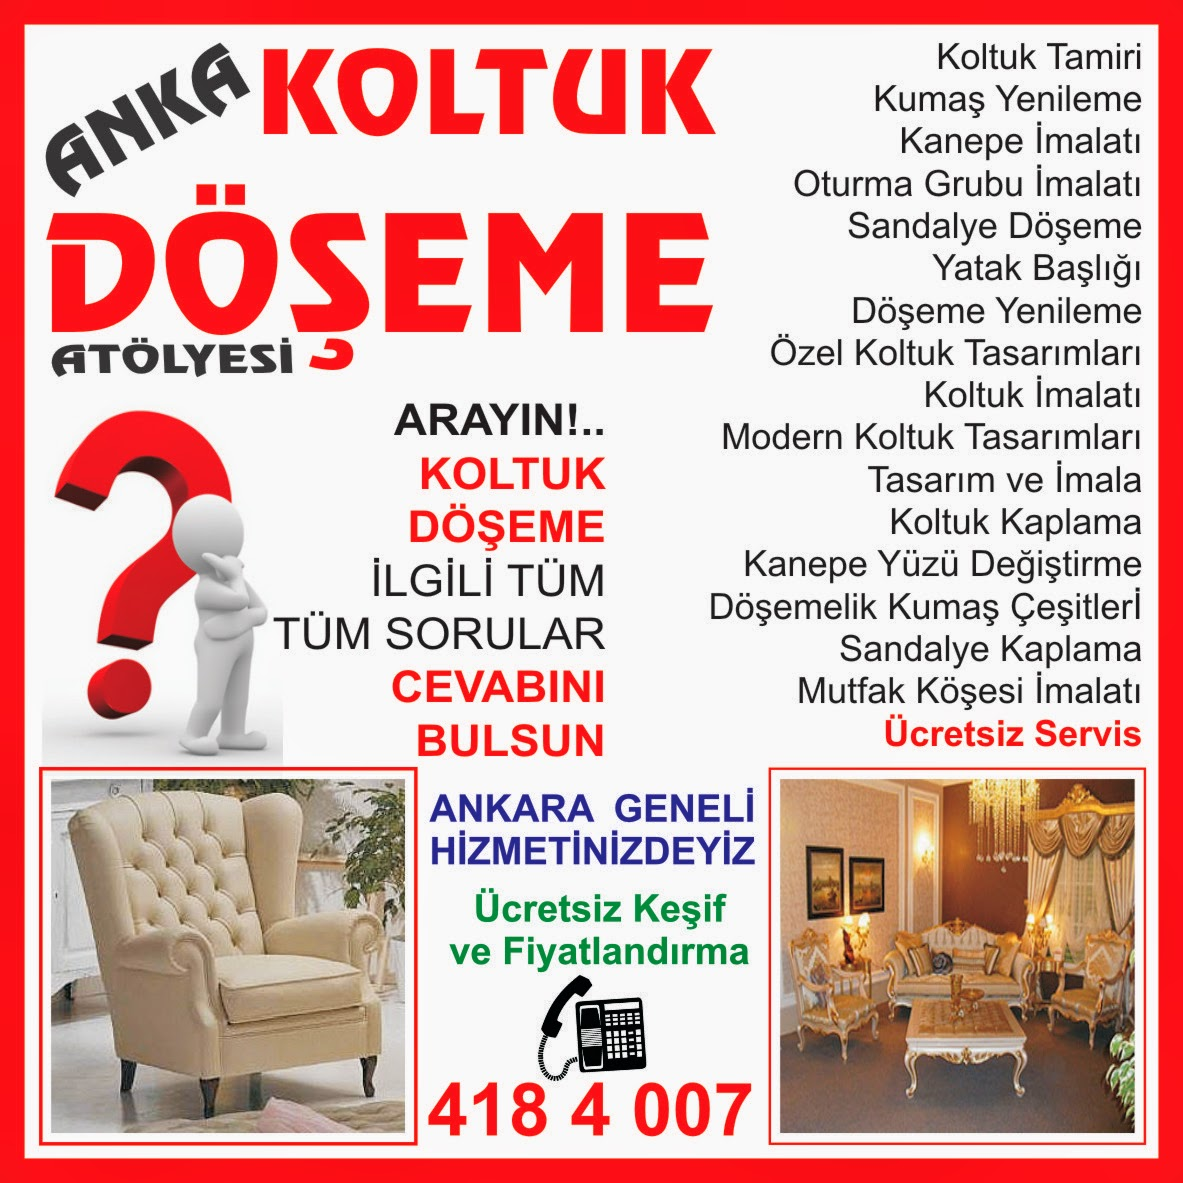 Yenimahalle Esnaf Rehberi Koltuk Tamiri Ankara Koltuk